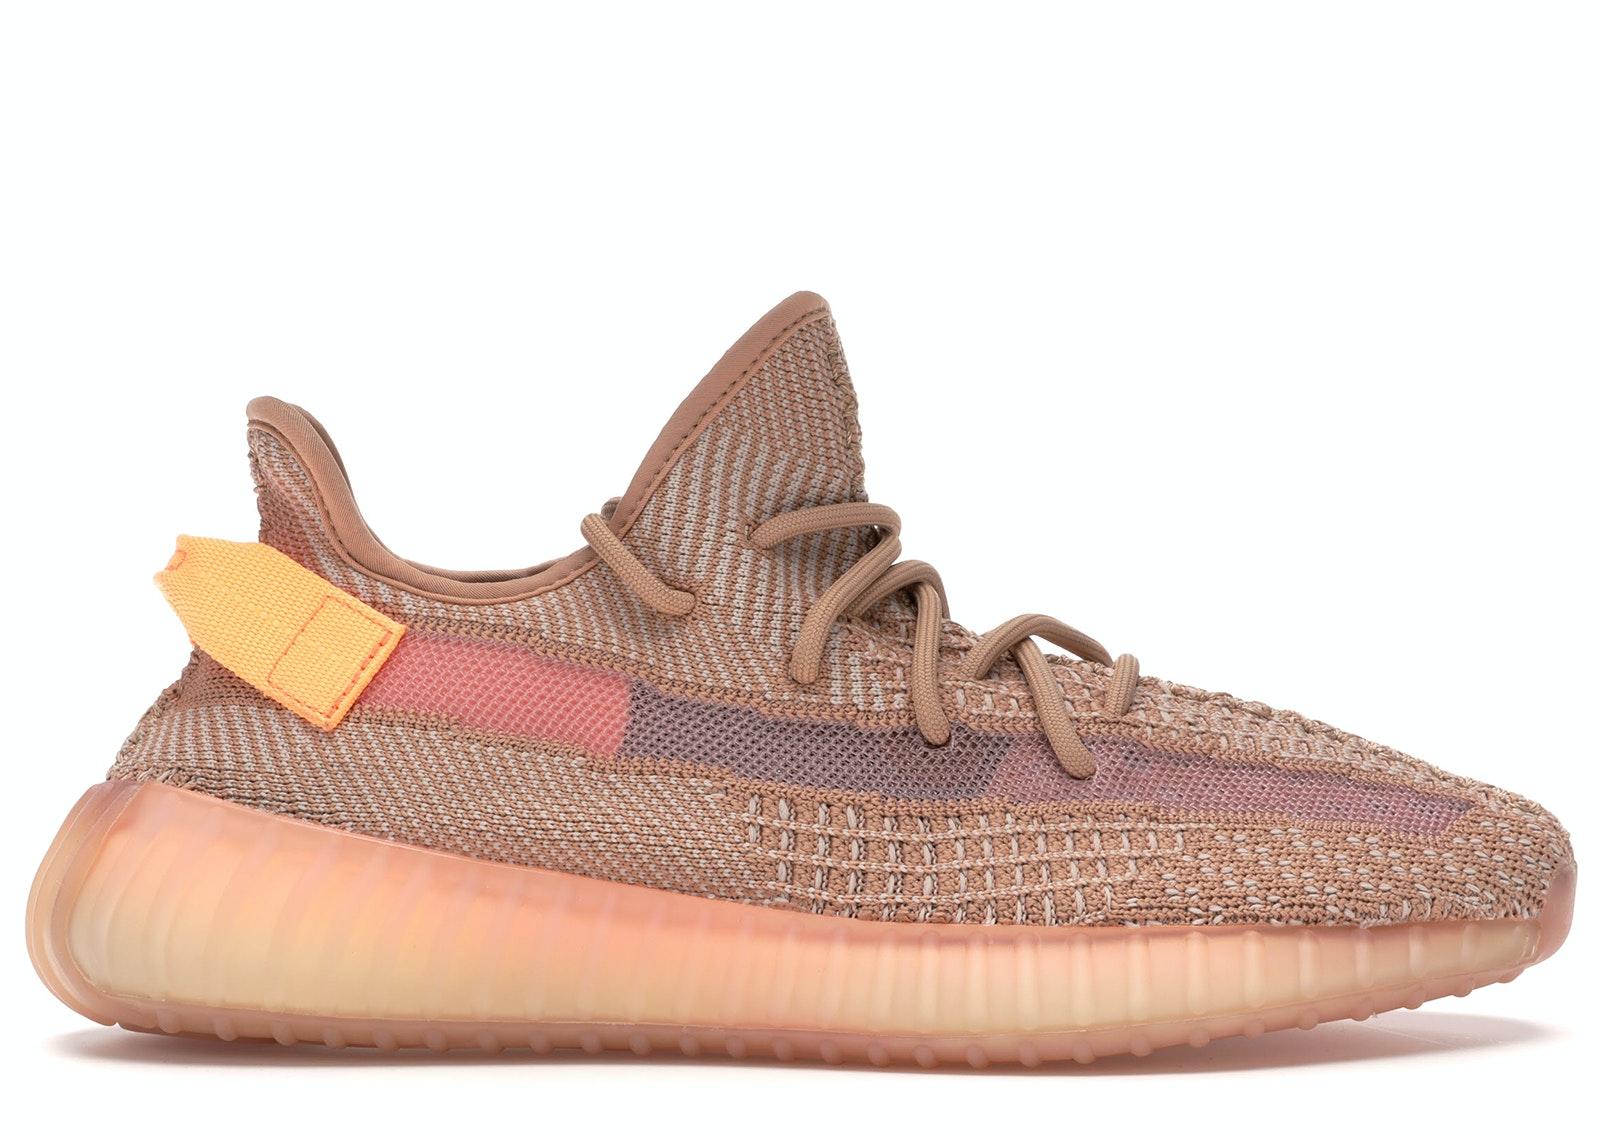 9c2da999e58 ... adidas shoes yeezy boost 350 adidas Yeezy Boost 350 V2 ...